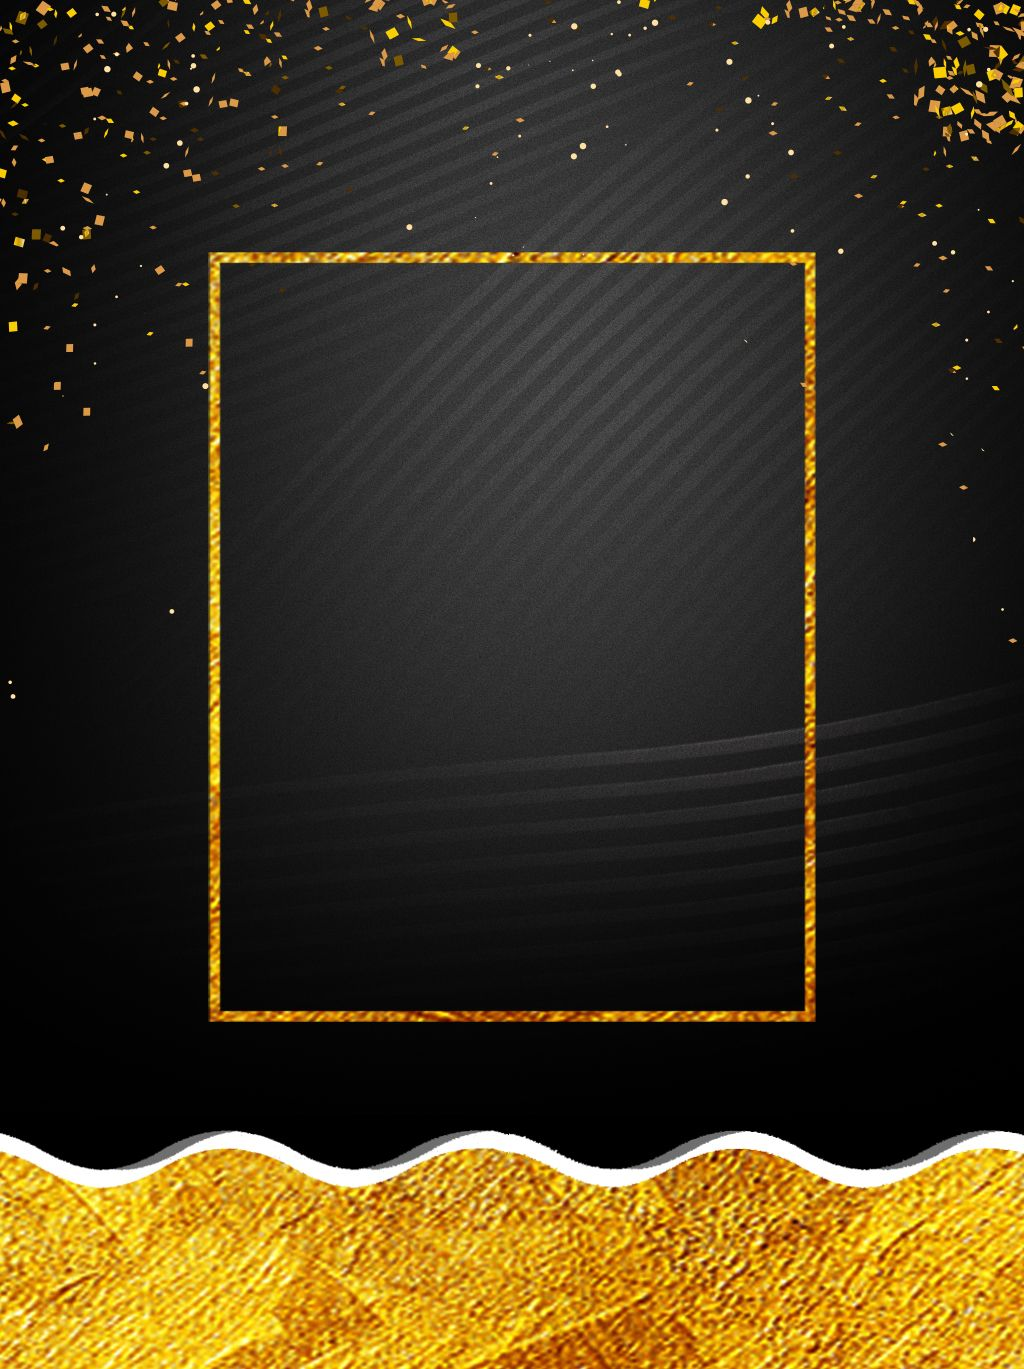 Kreatives Plakathintergrunddesign Des Schwarzen Goldwindes Kreative Plakate Hintergrund Design Poster Design